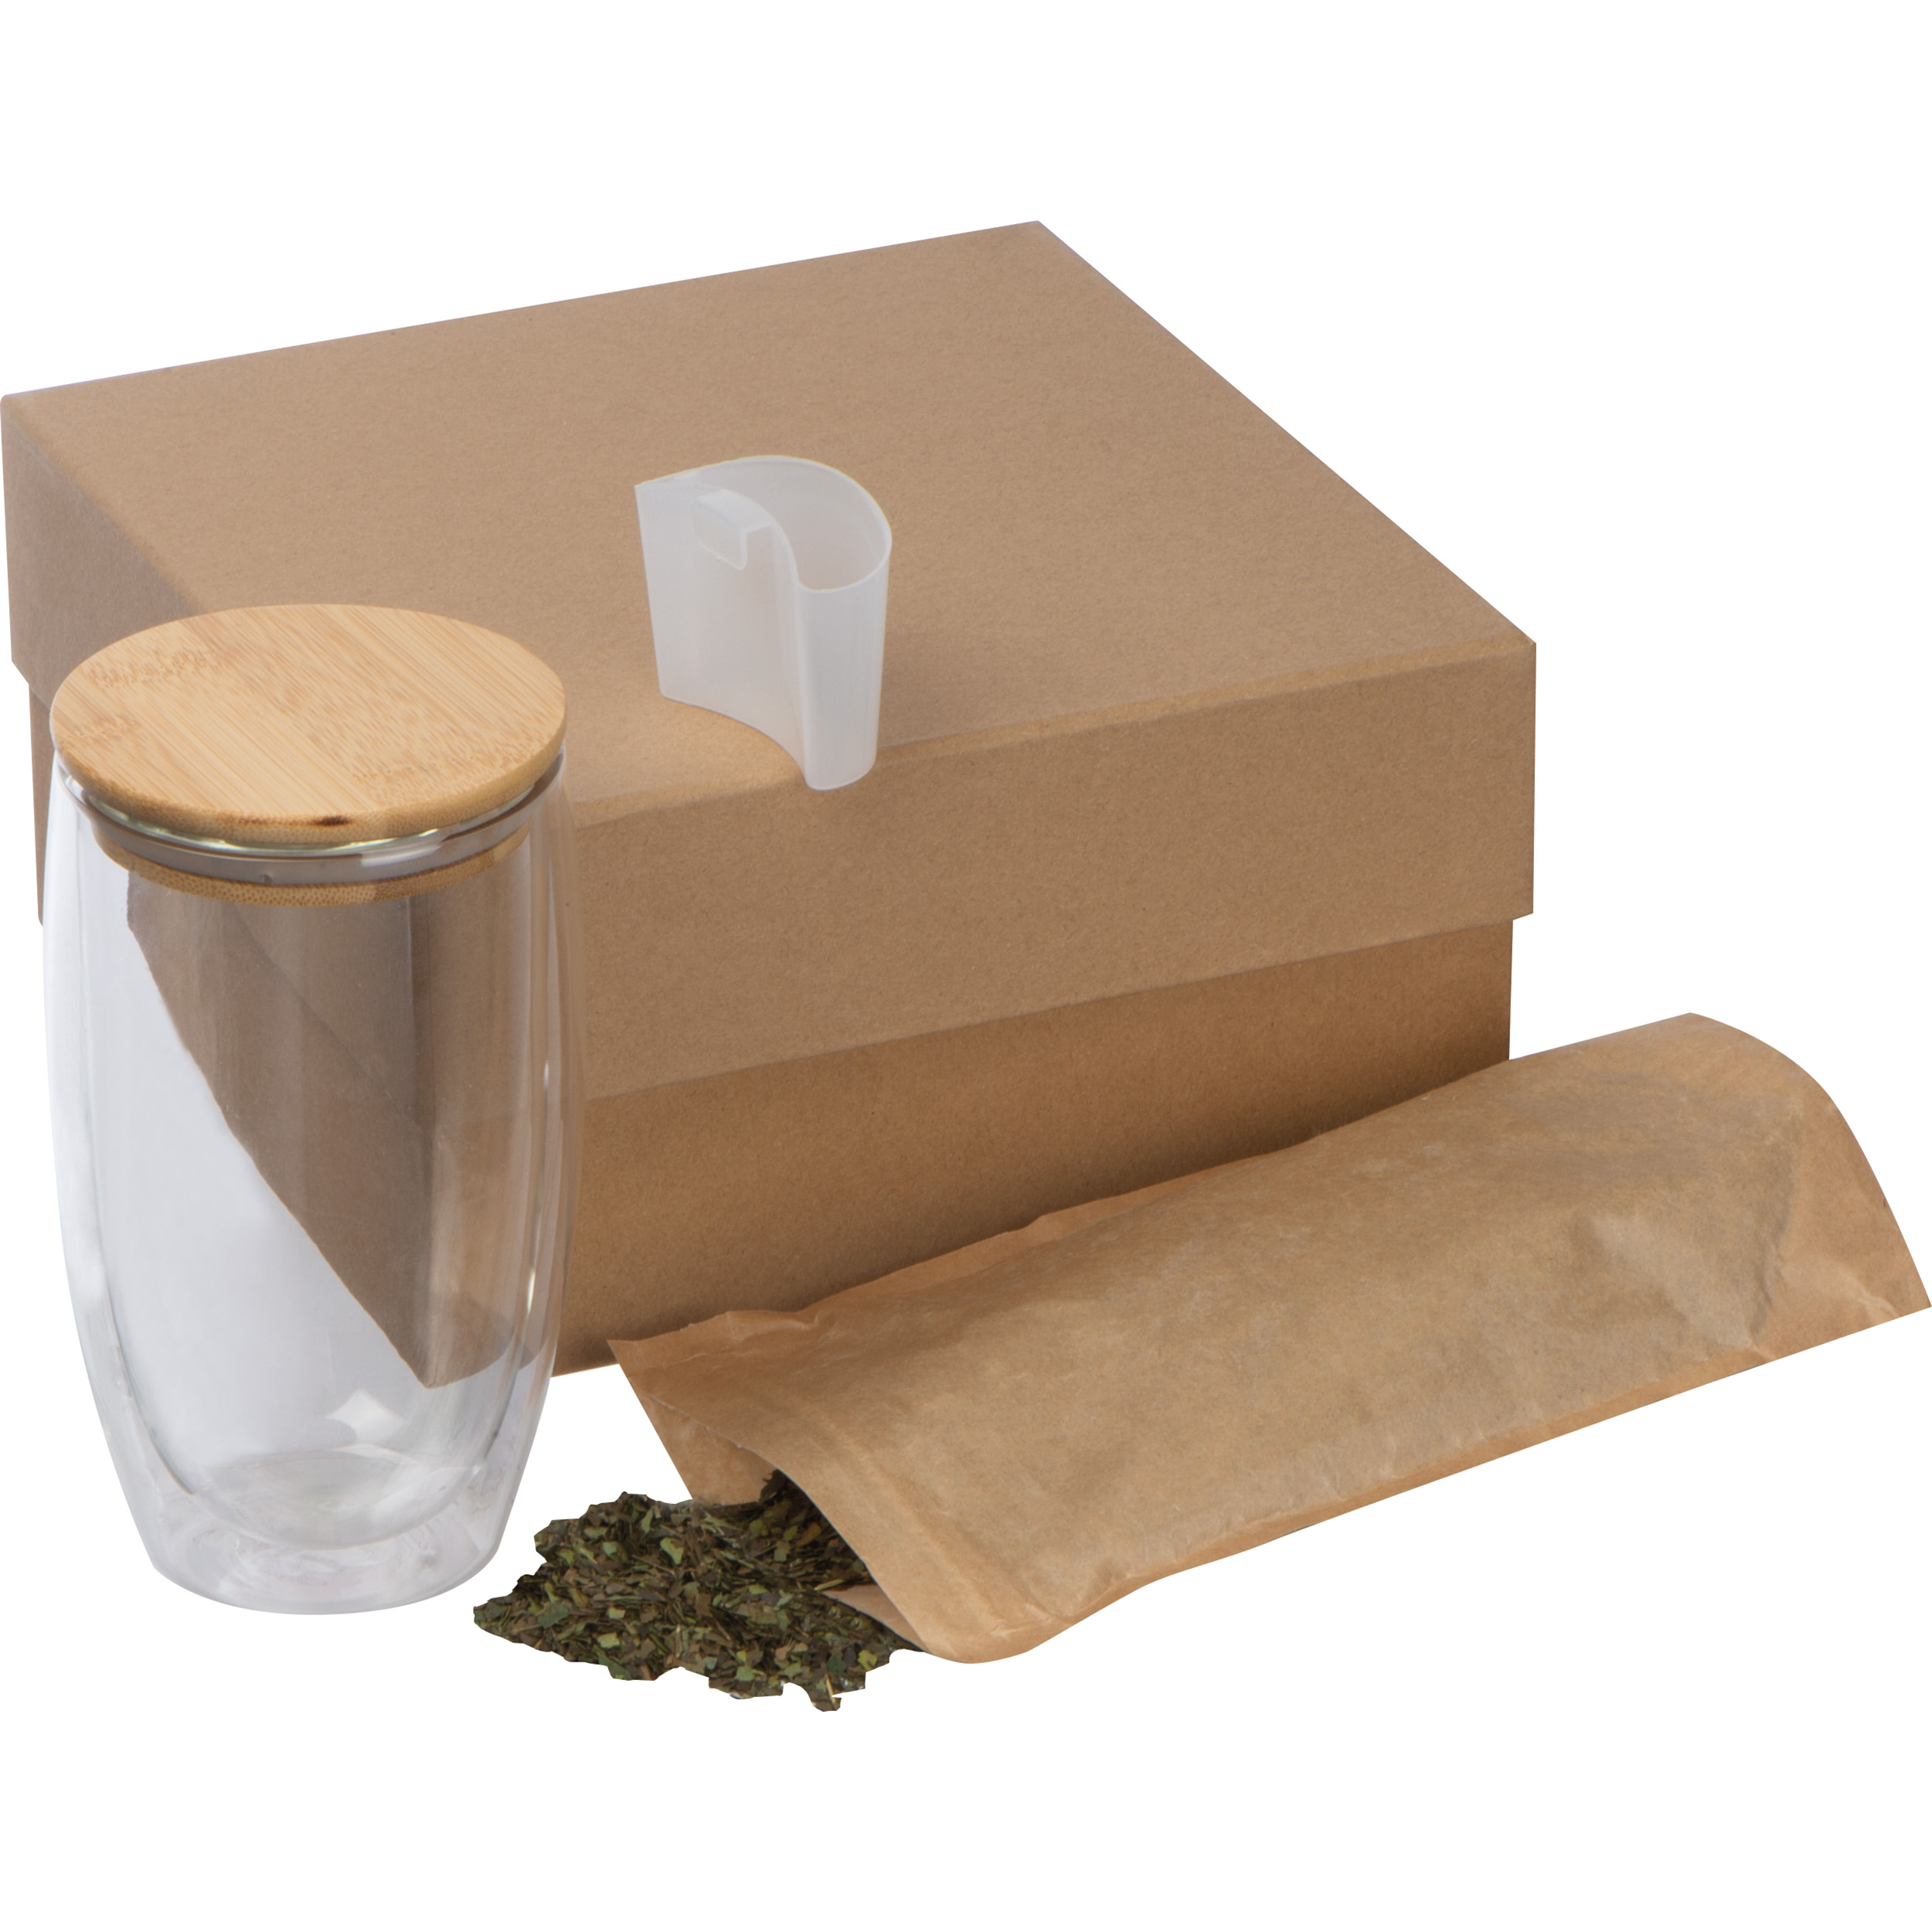 Geschenkset mit Teeglas, schwarzem Tee & Teebeutelhalter